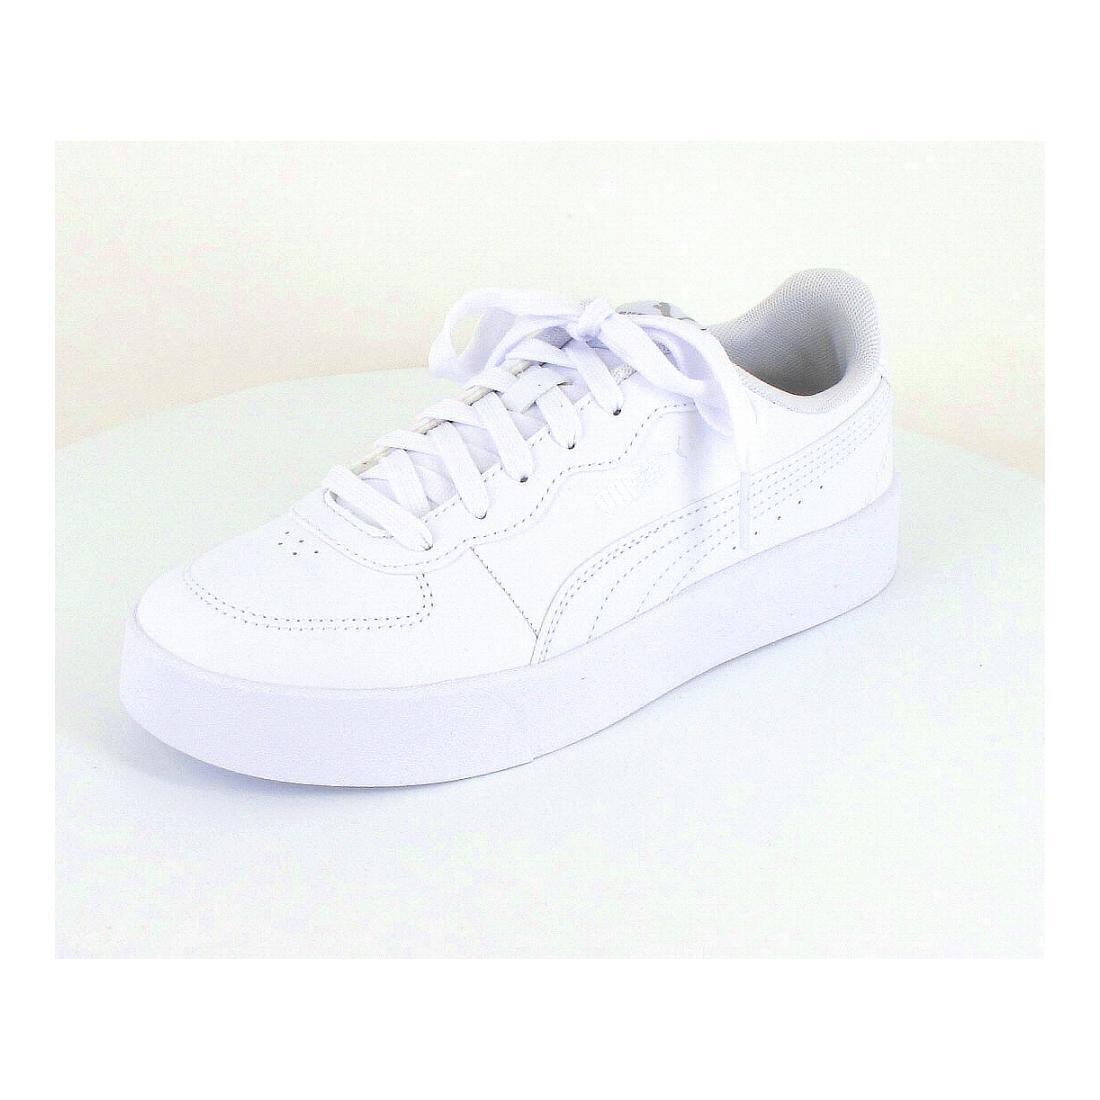 Puma Sneaker Skye Clean